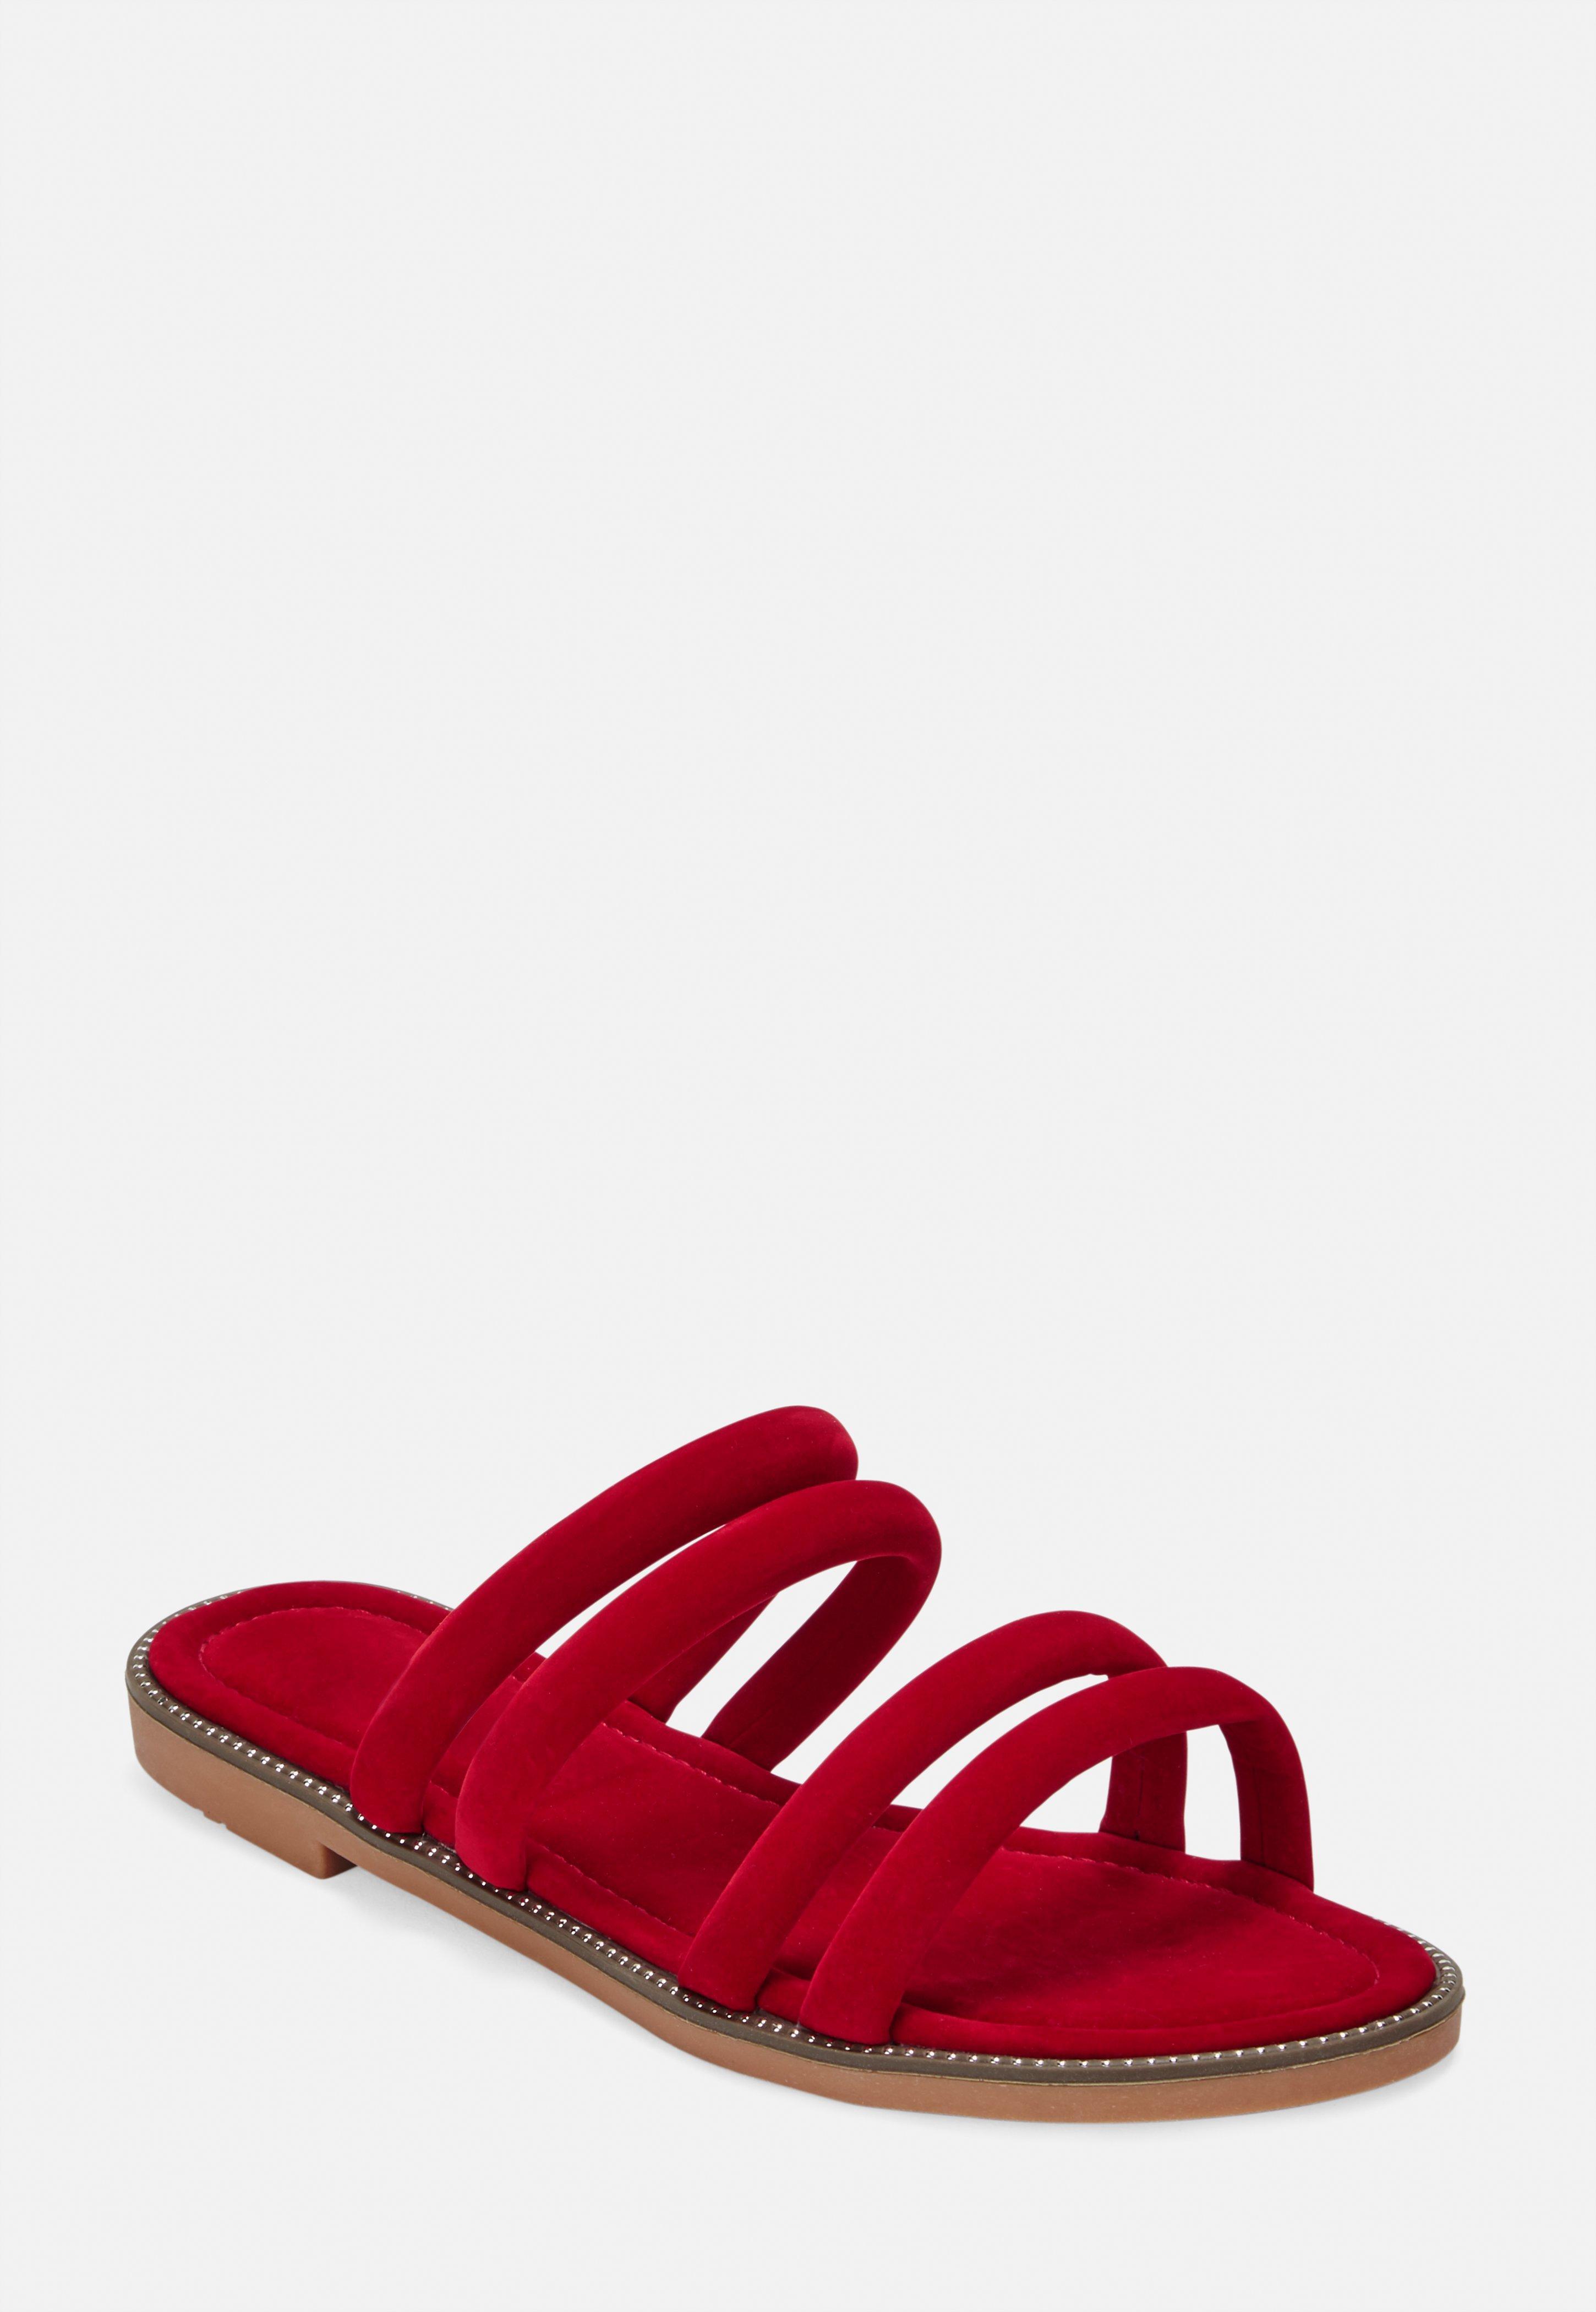 c03ba260be8 Red Multi Strap Slip On Sandals